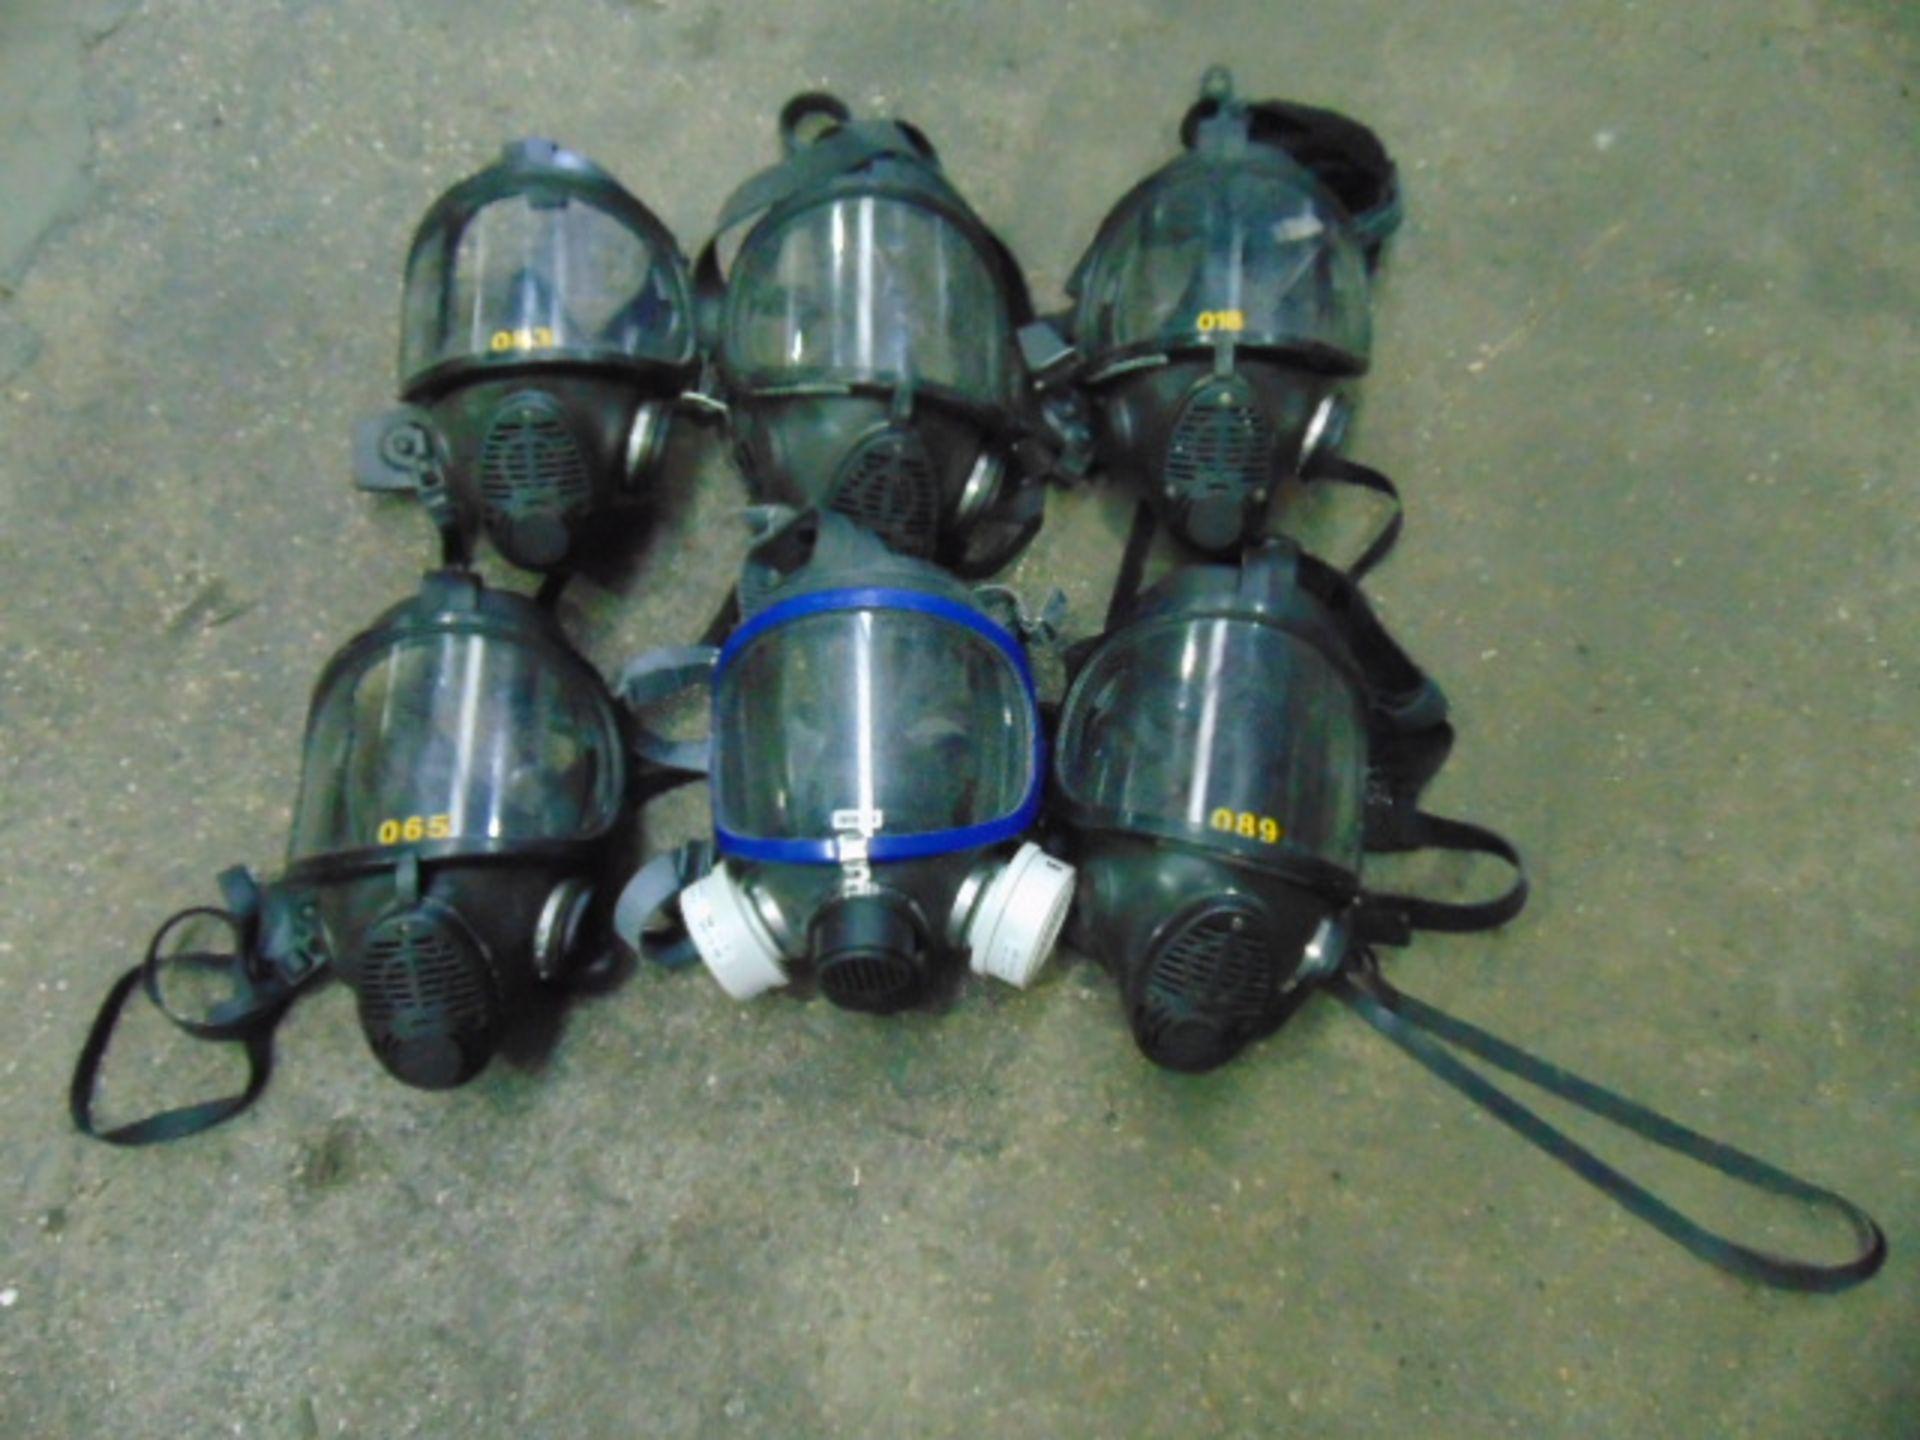 Lotto 26400 - 6 x Breathing Apparatus Masks